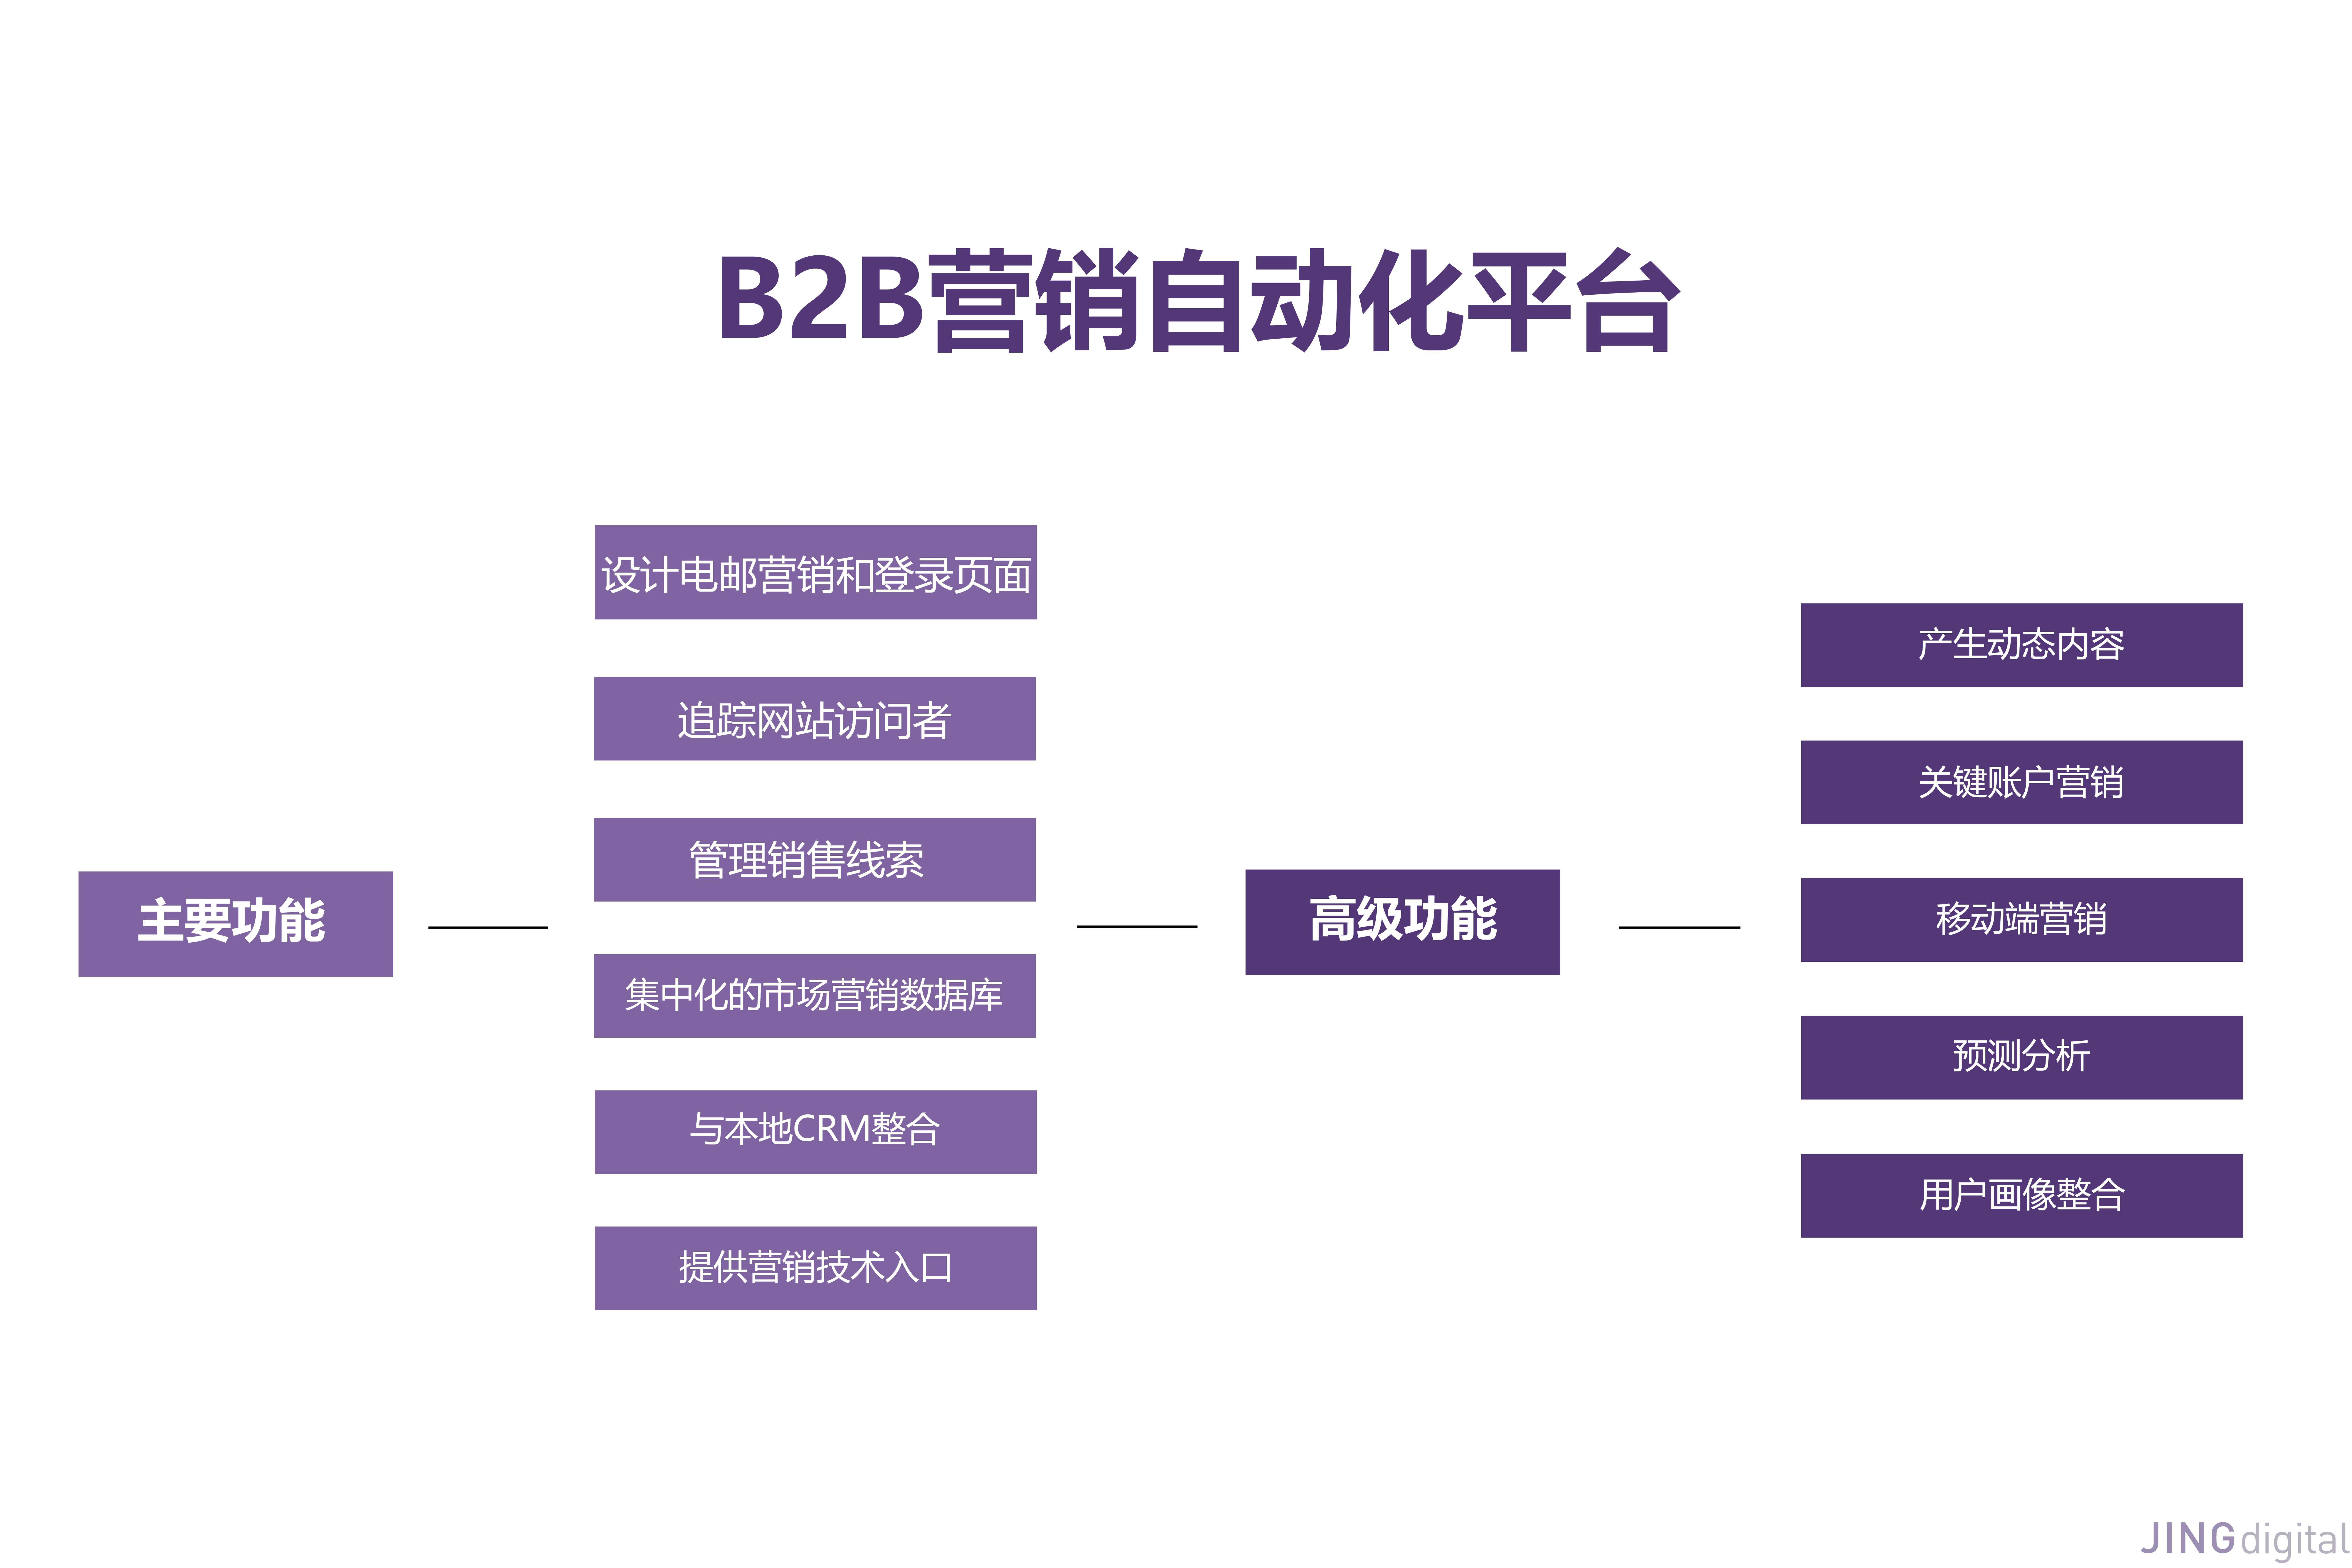 B2B营销自动化平台的功能